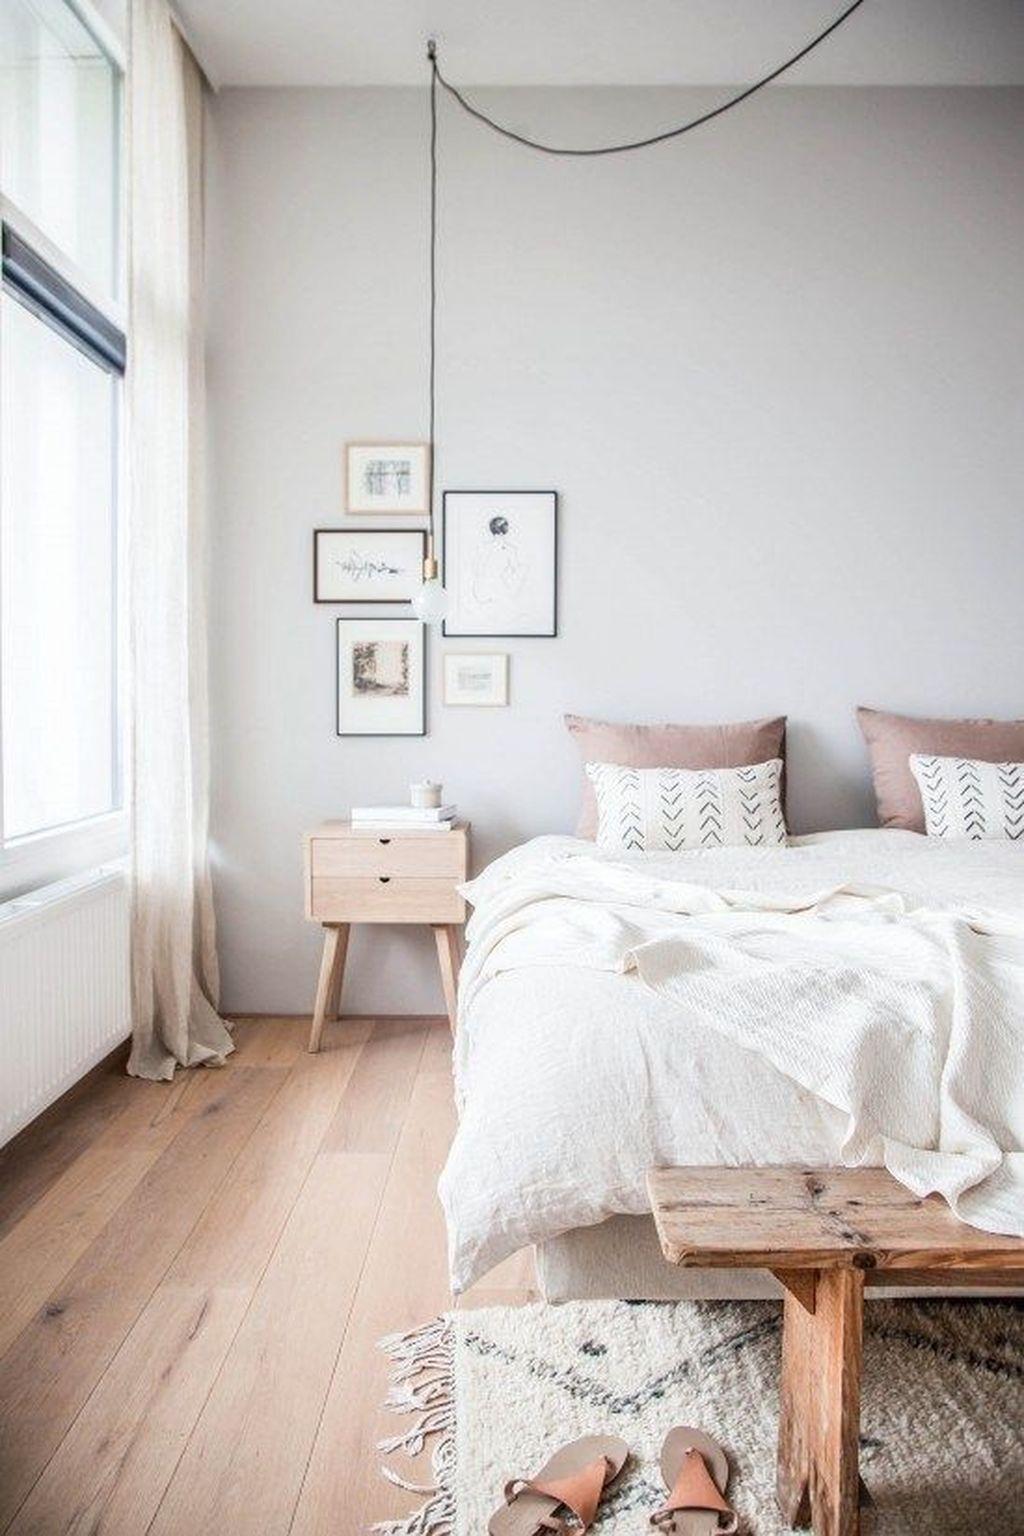 Best Minimalist Bedroom Design Ideas To Try Asap 25